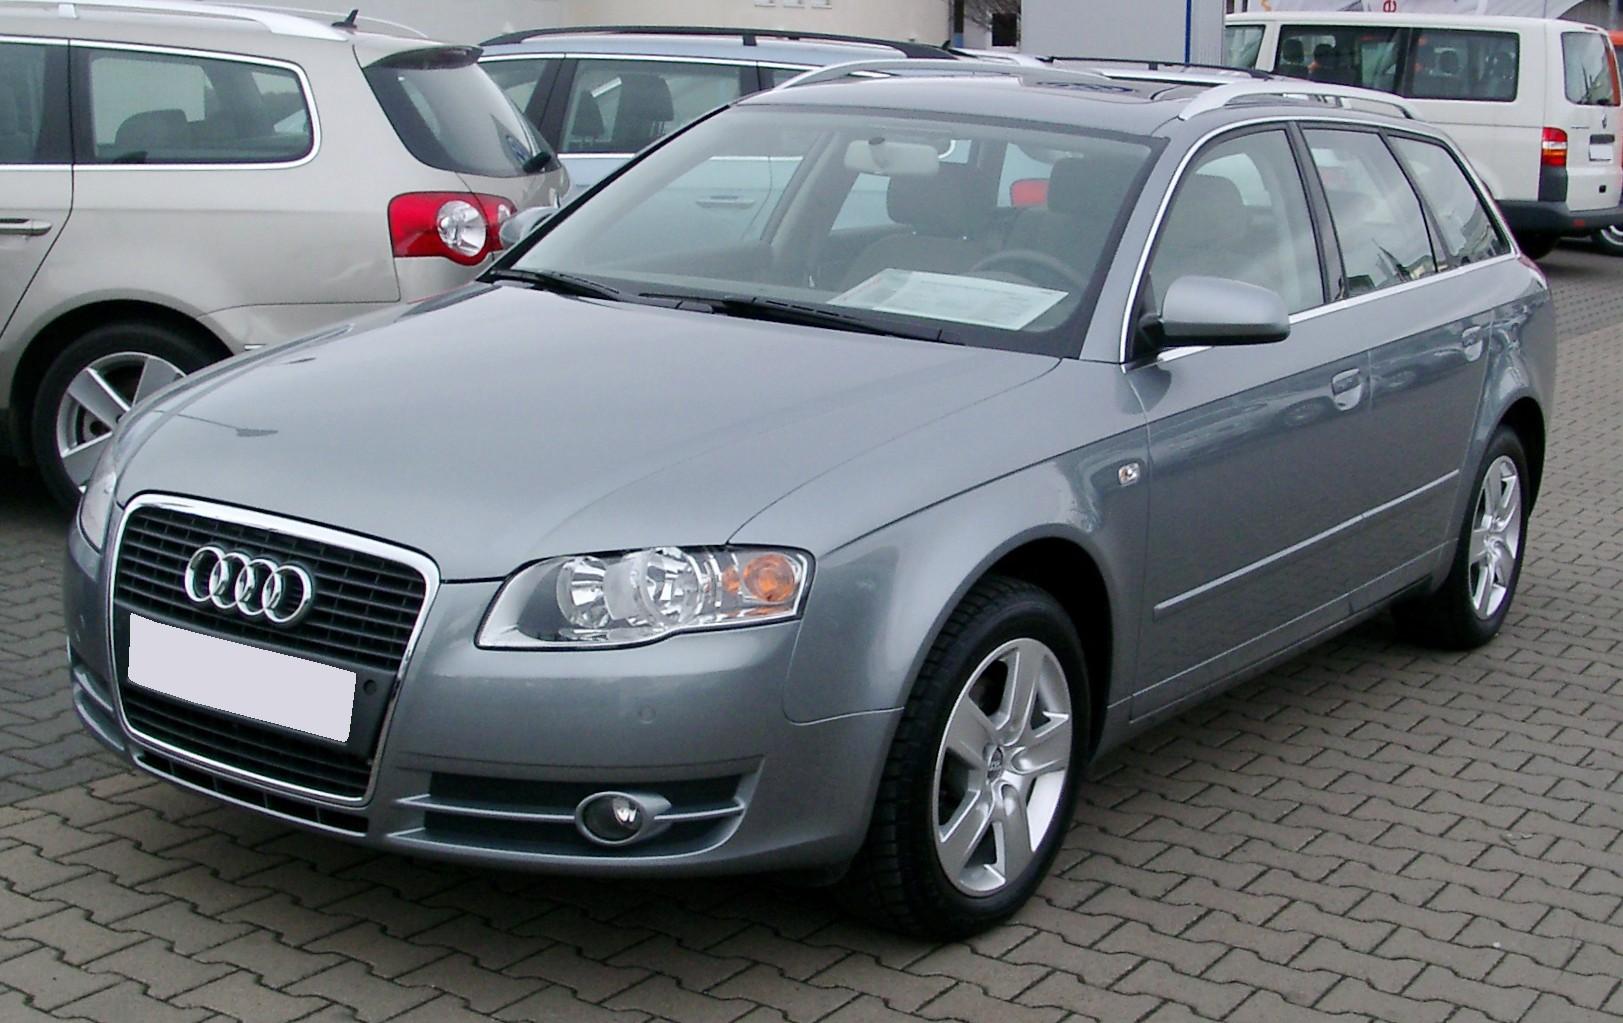 File:Audi A4 B7 Avant front 20080121.jpg - Wikimedia Commons